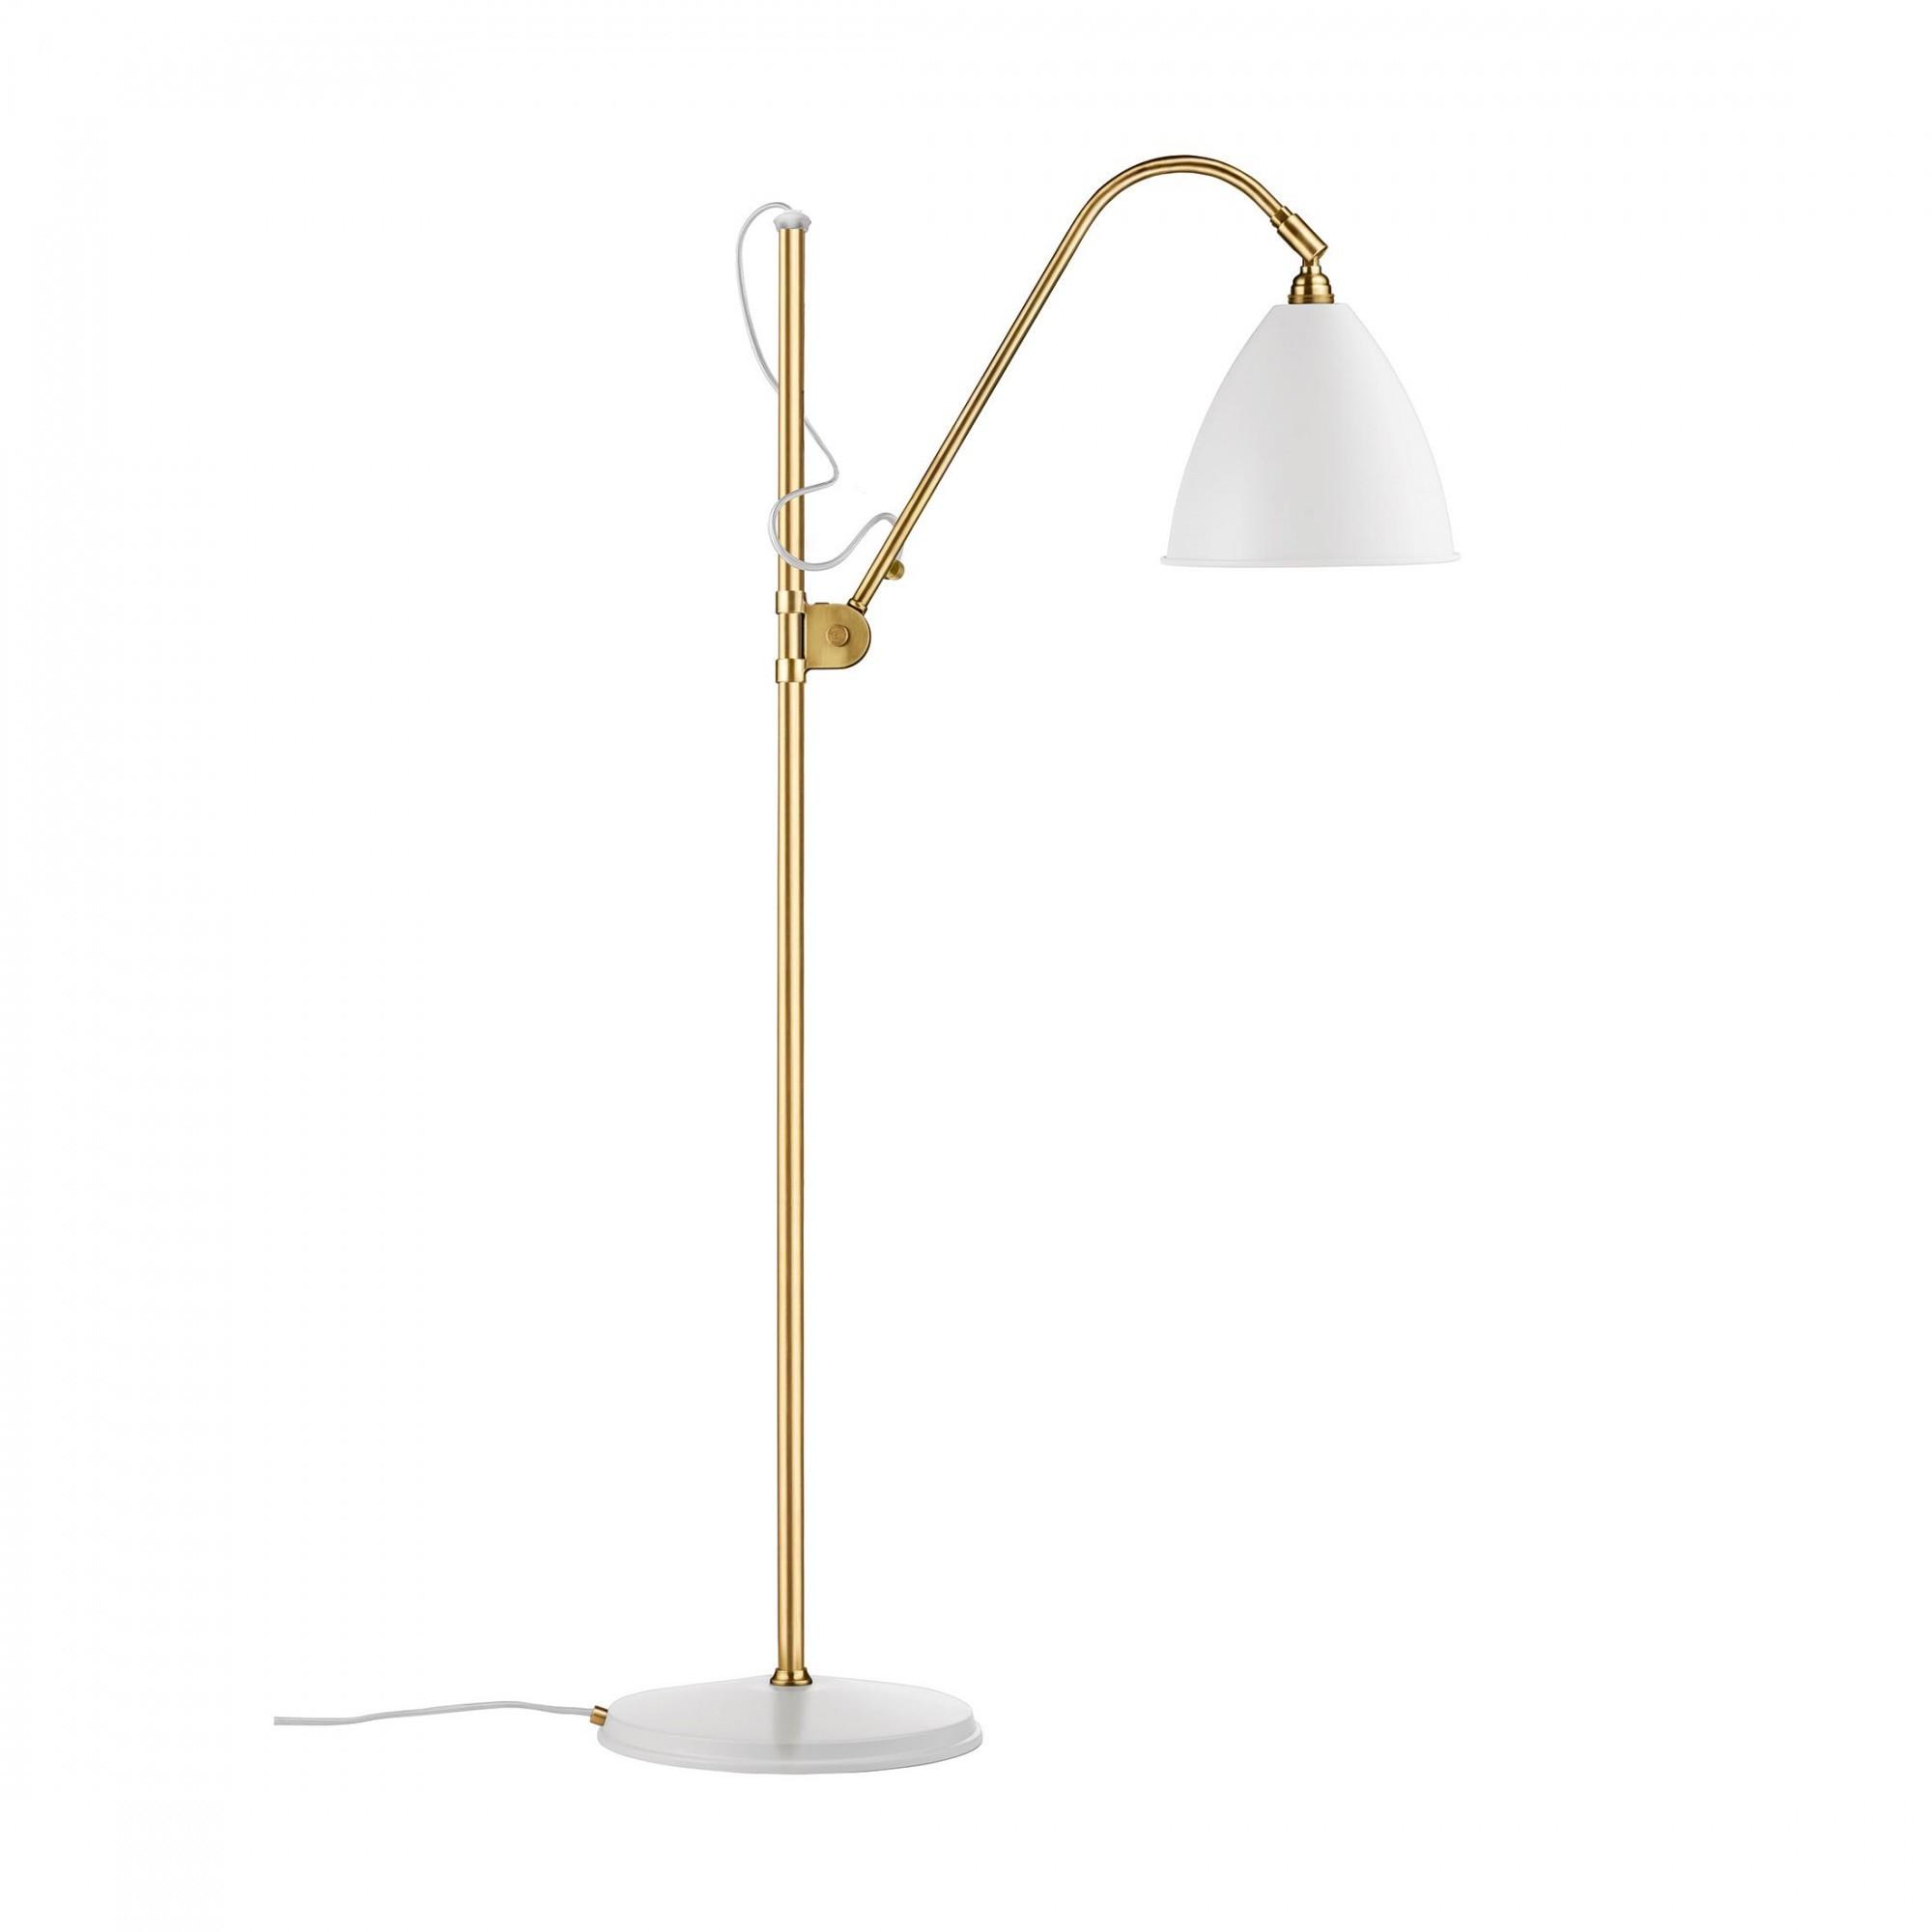 Bestlite Bl3 M Floor Lamp